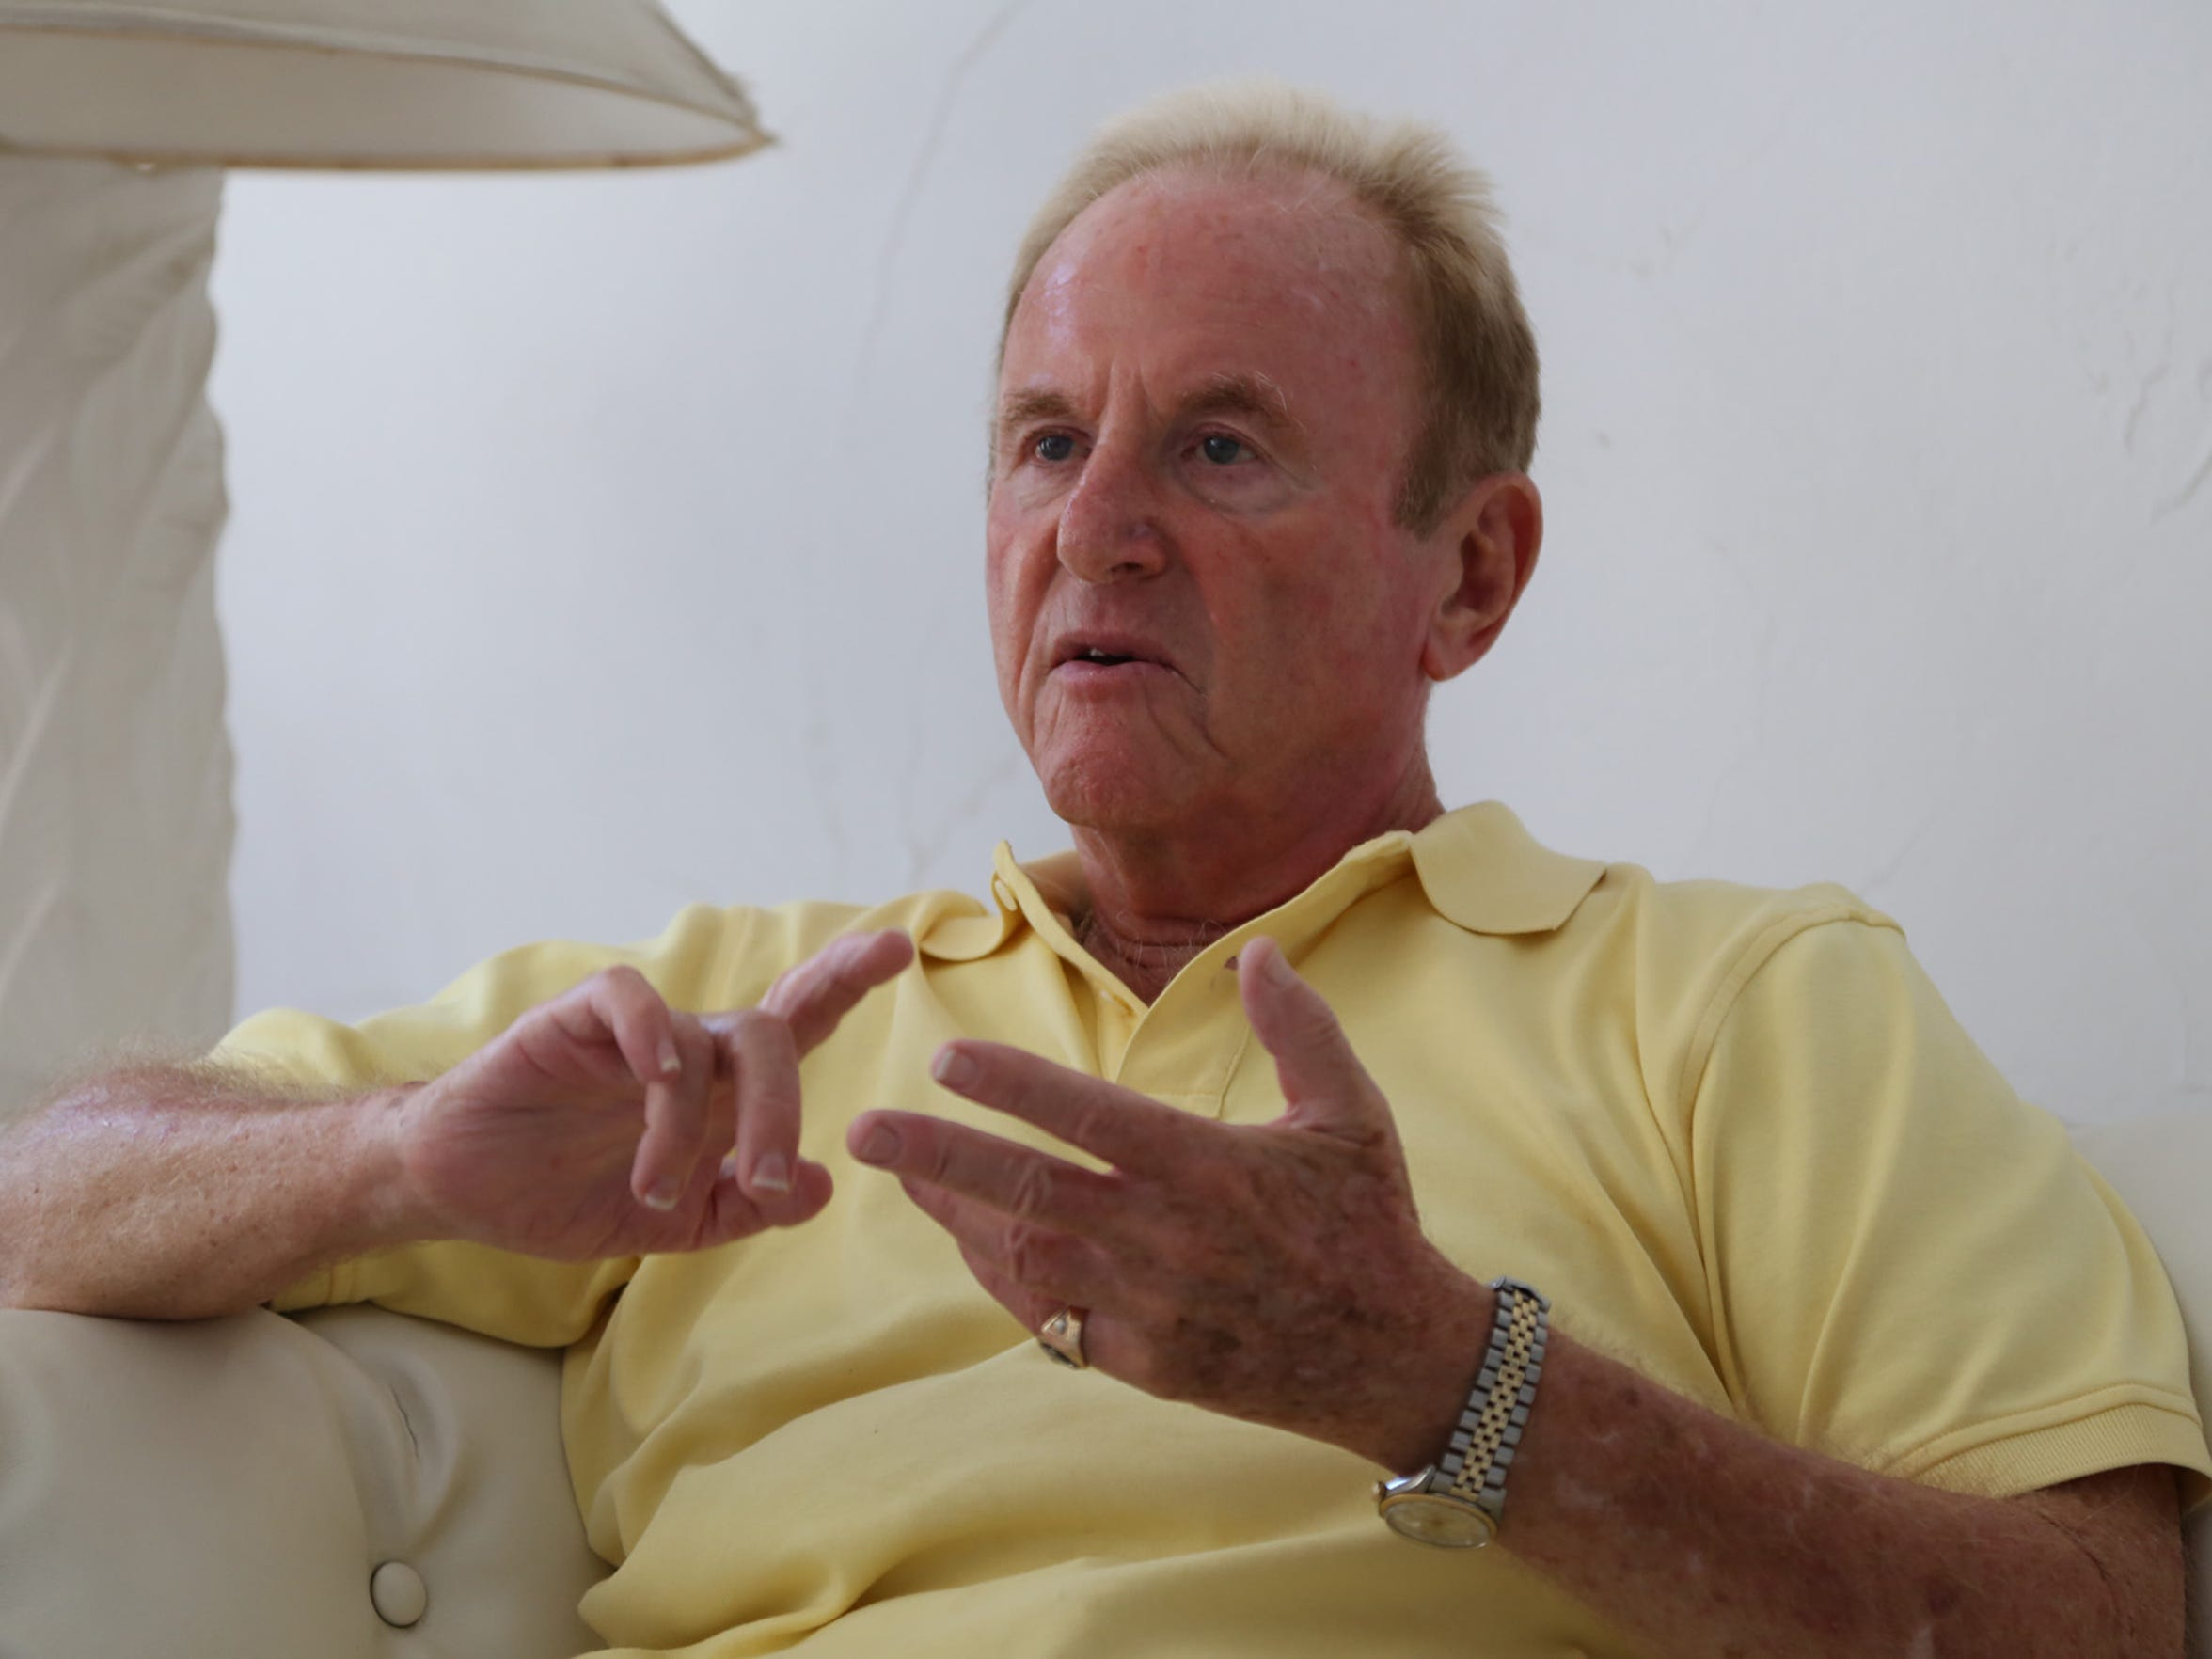 Entertainment agent Larry Spellman talks about his